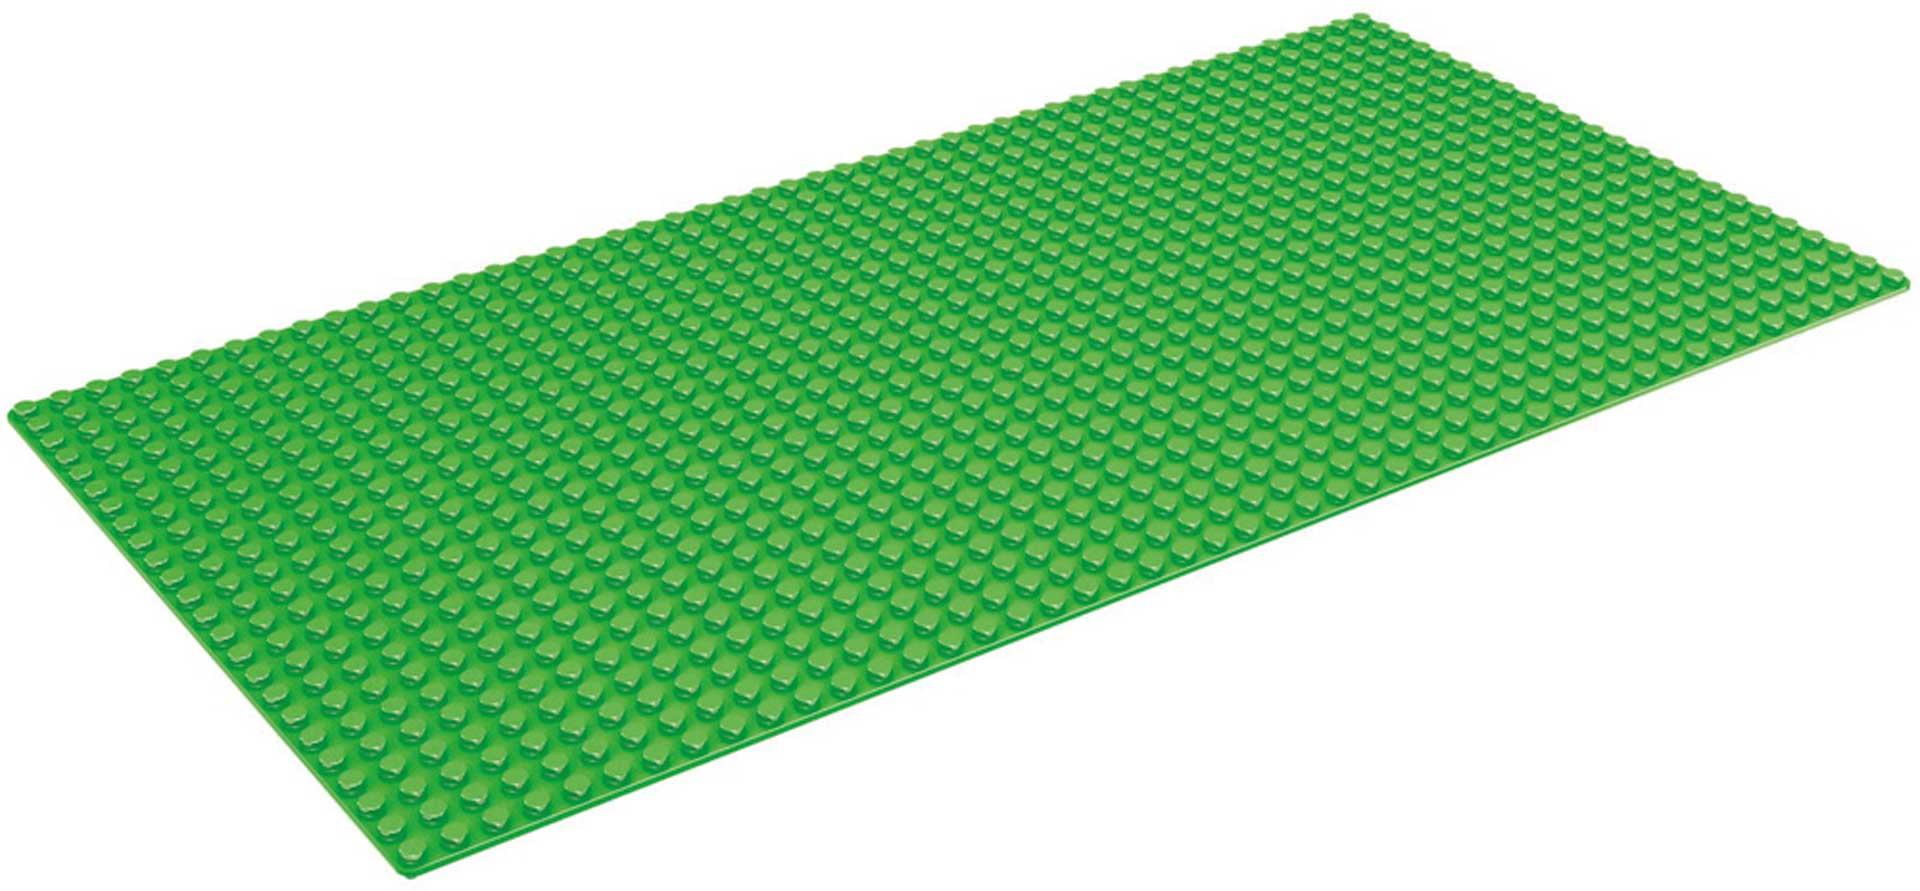 Wange Grundplatte grün 24x48 Noppen ca 38,5cm x 19cm